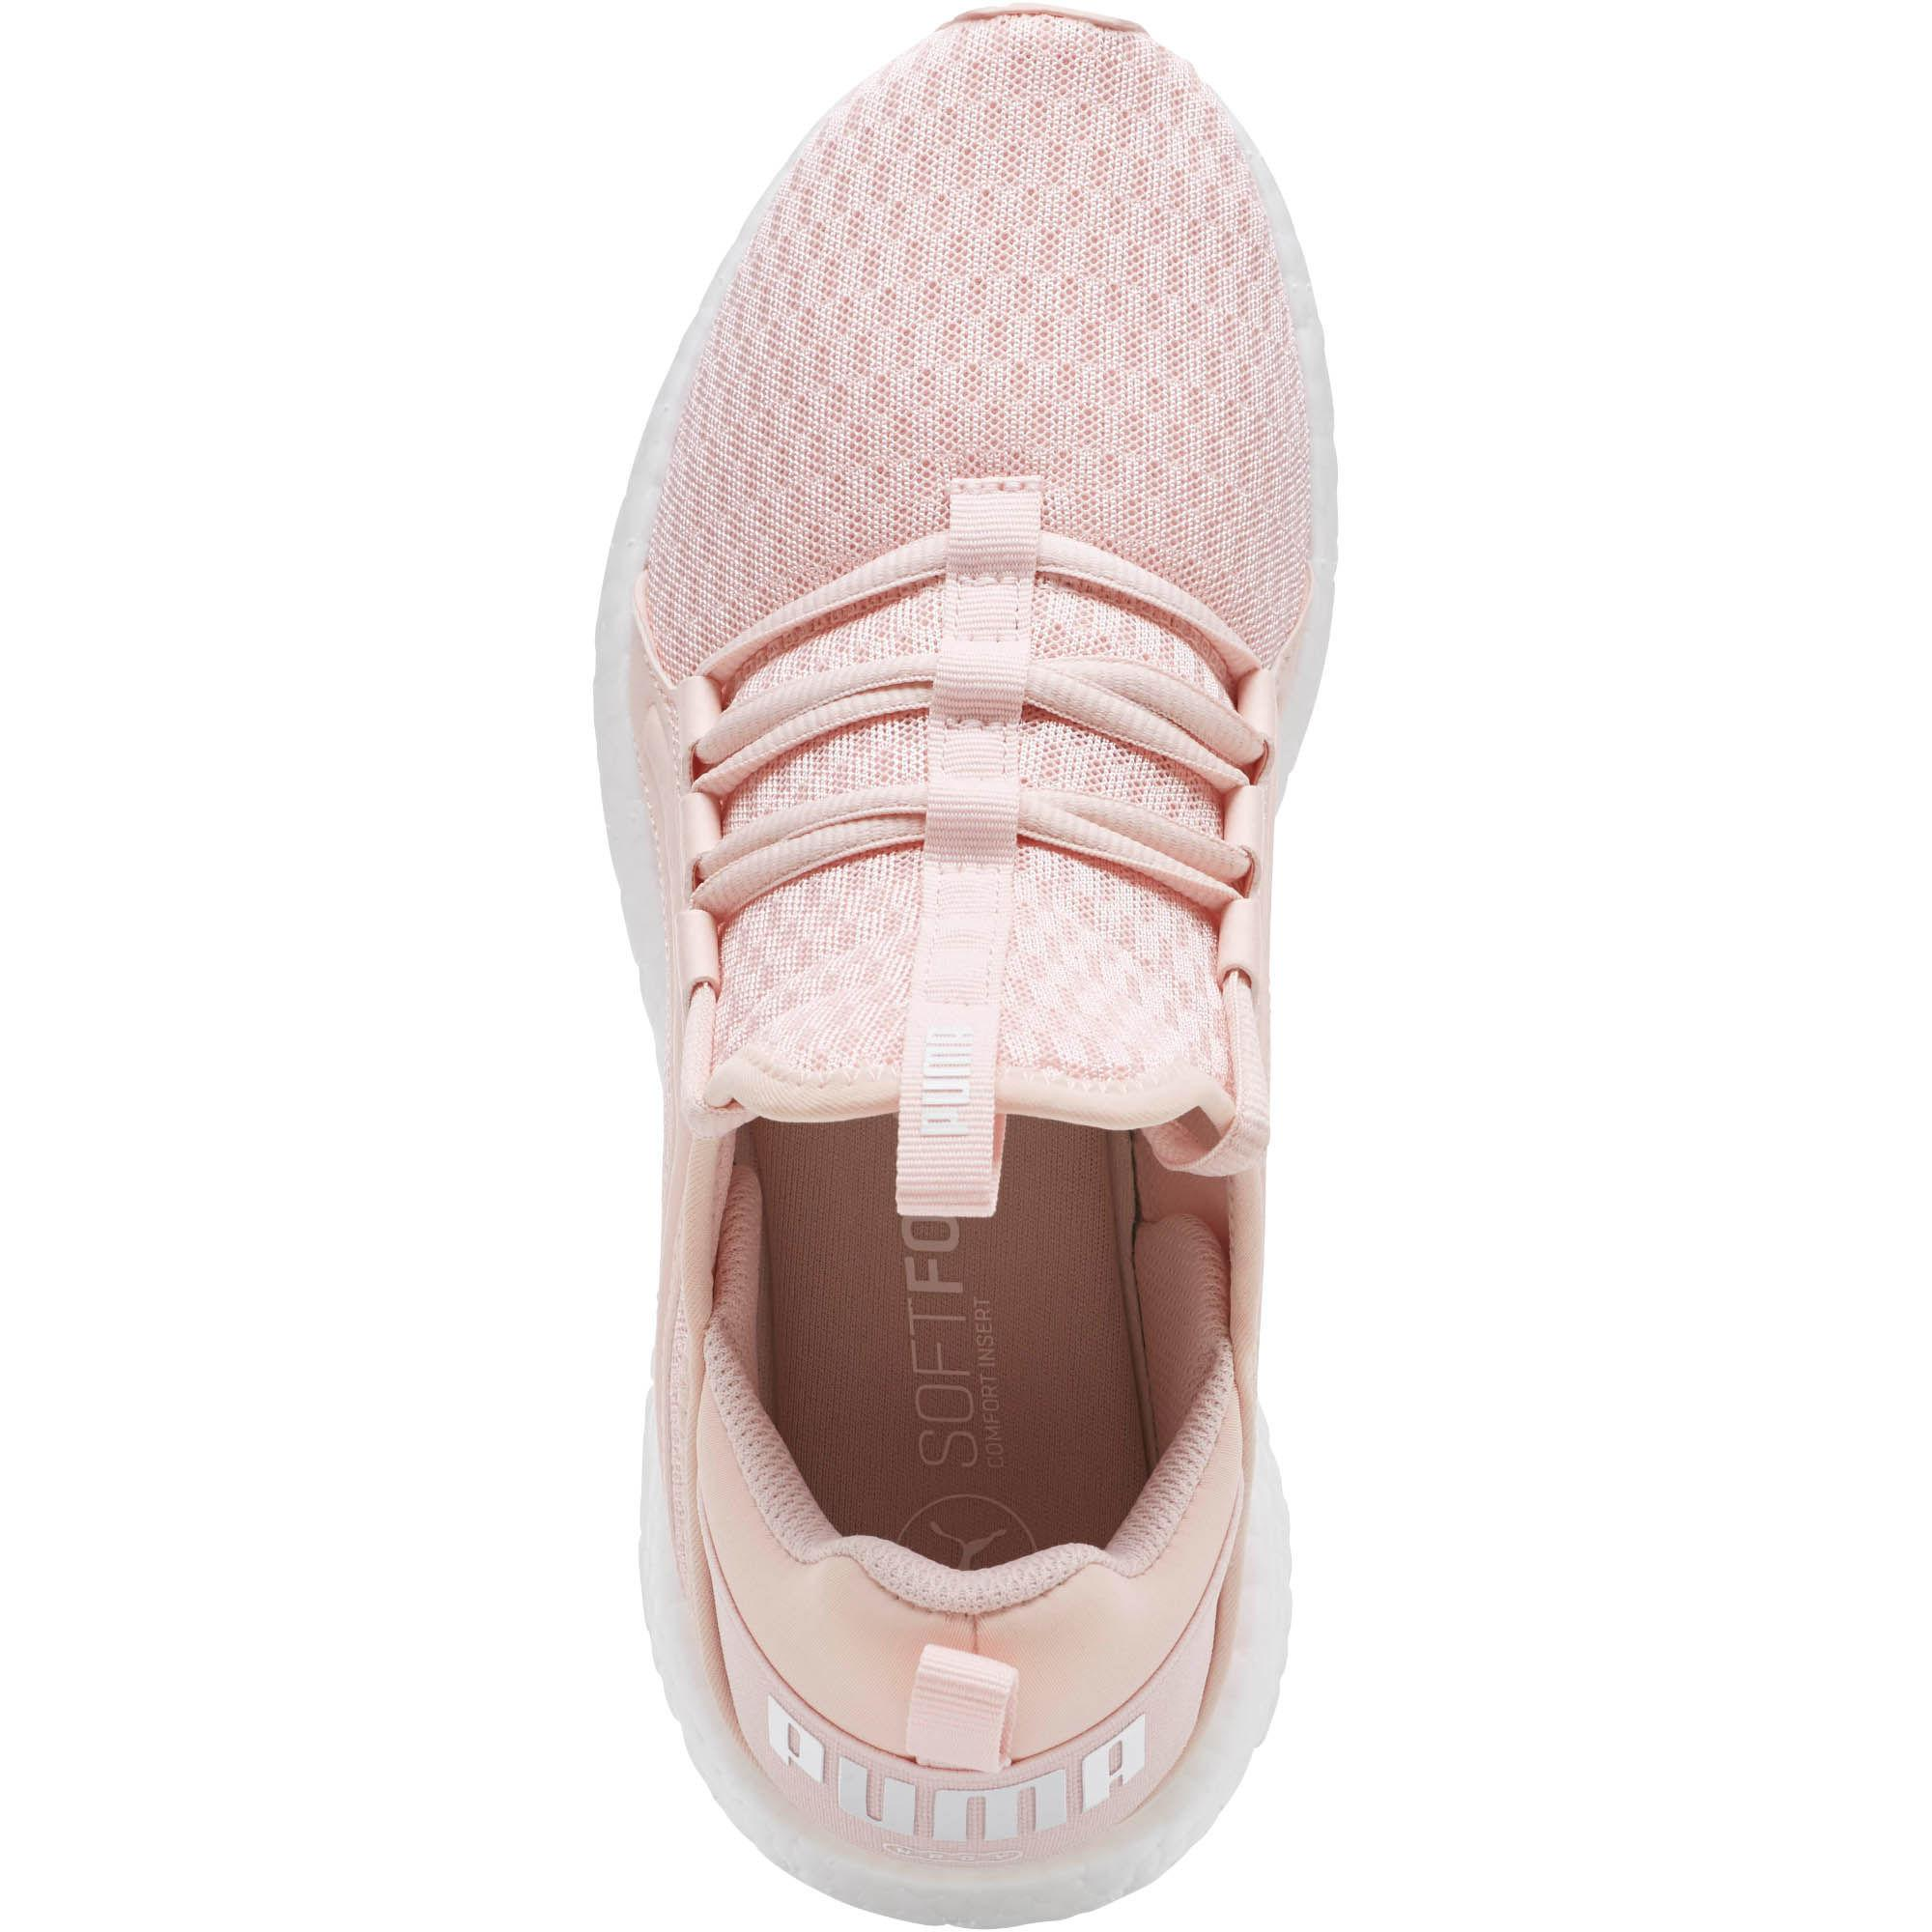 c4a29be283 PUMA Pink Mega Nrgy Women's Trainers